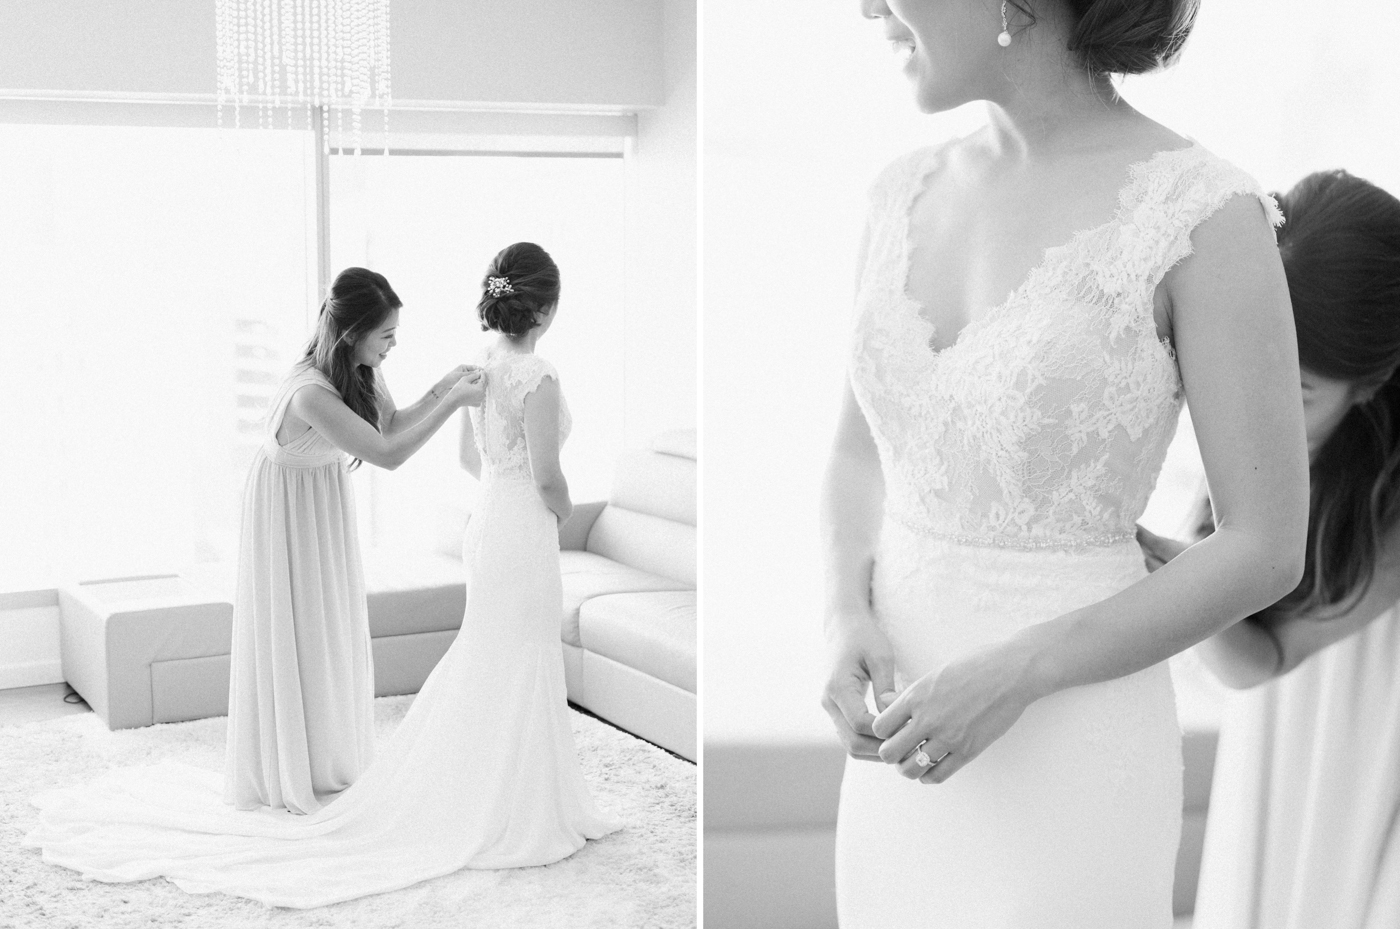 Modern_Wedding_HNYPT_Honeypot_LA_Photographer_Los_Angeles-2.jpg